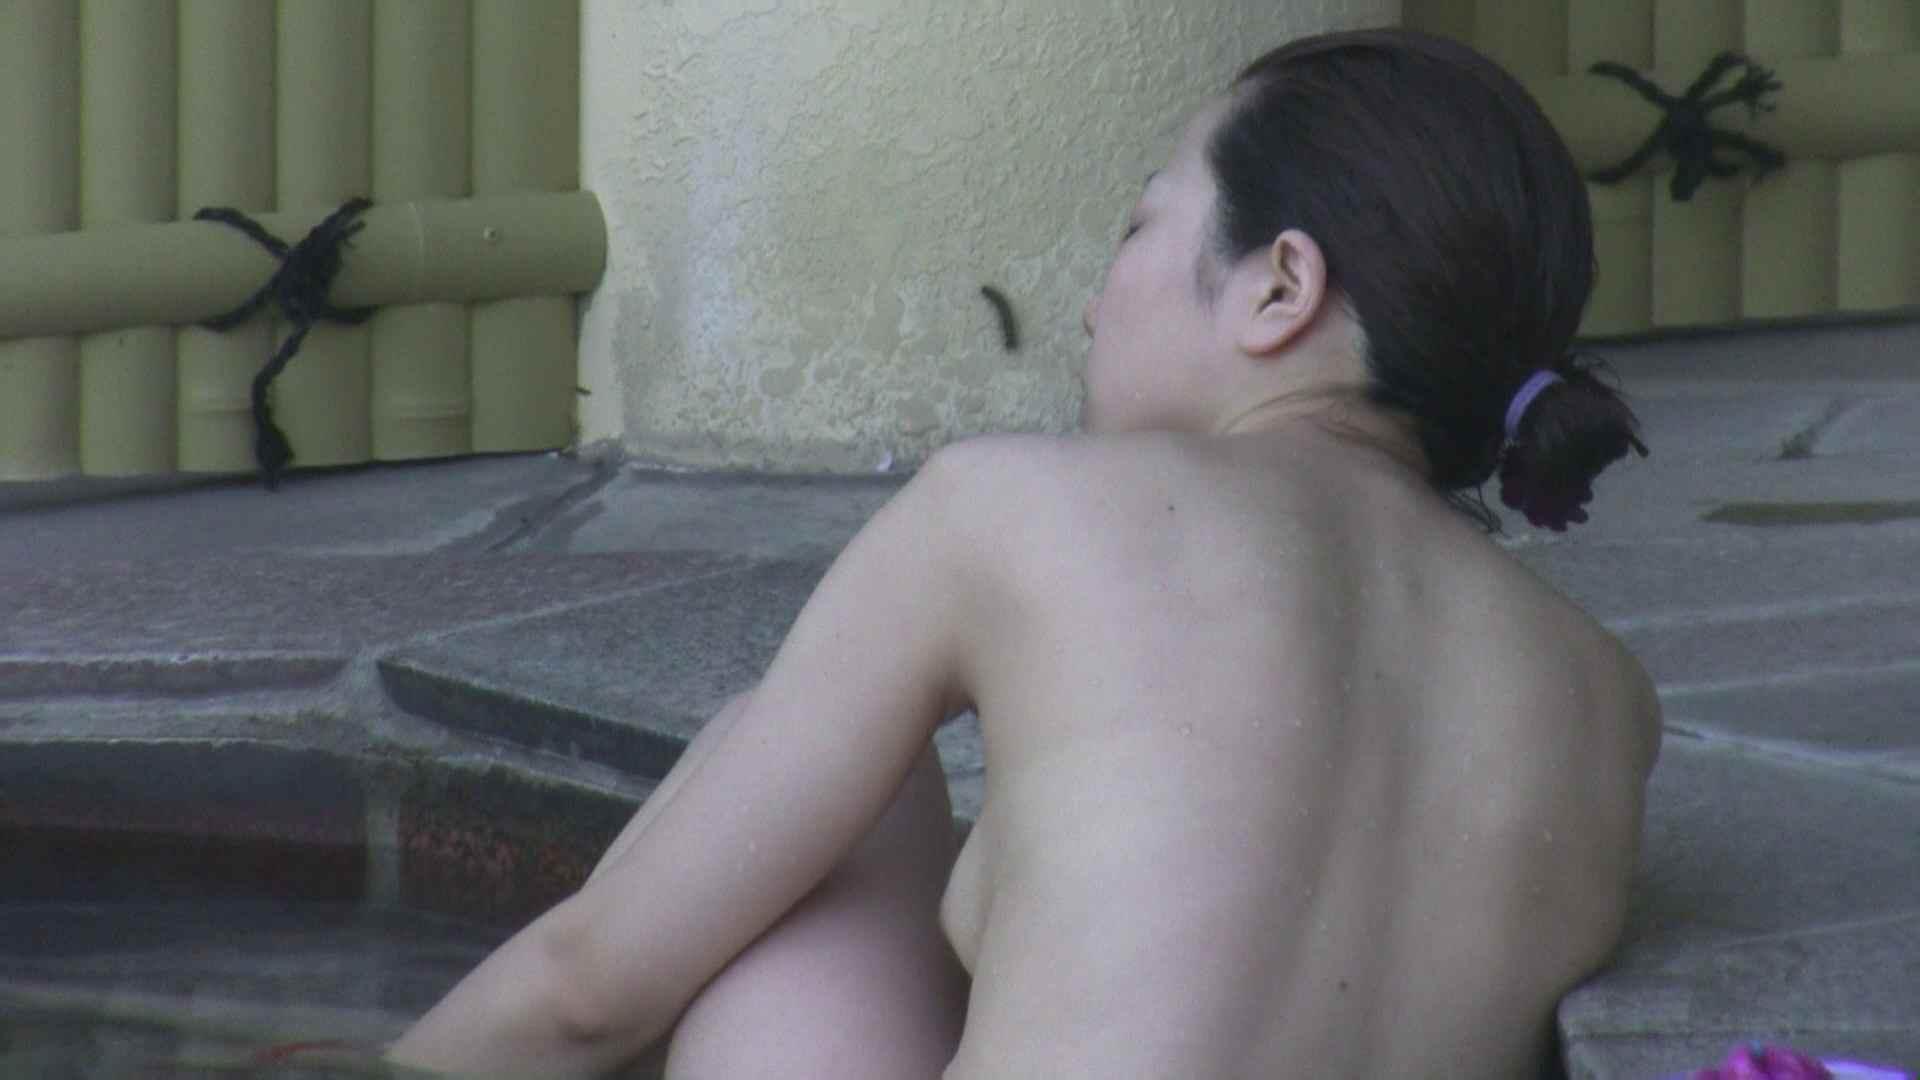 Aquaな露天風呂Vol.88【VIP限定】 綺麗なOLたち | 盗撮  57枚 46